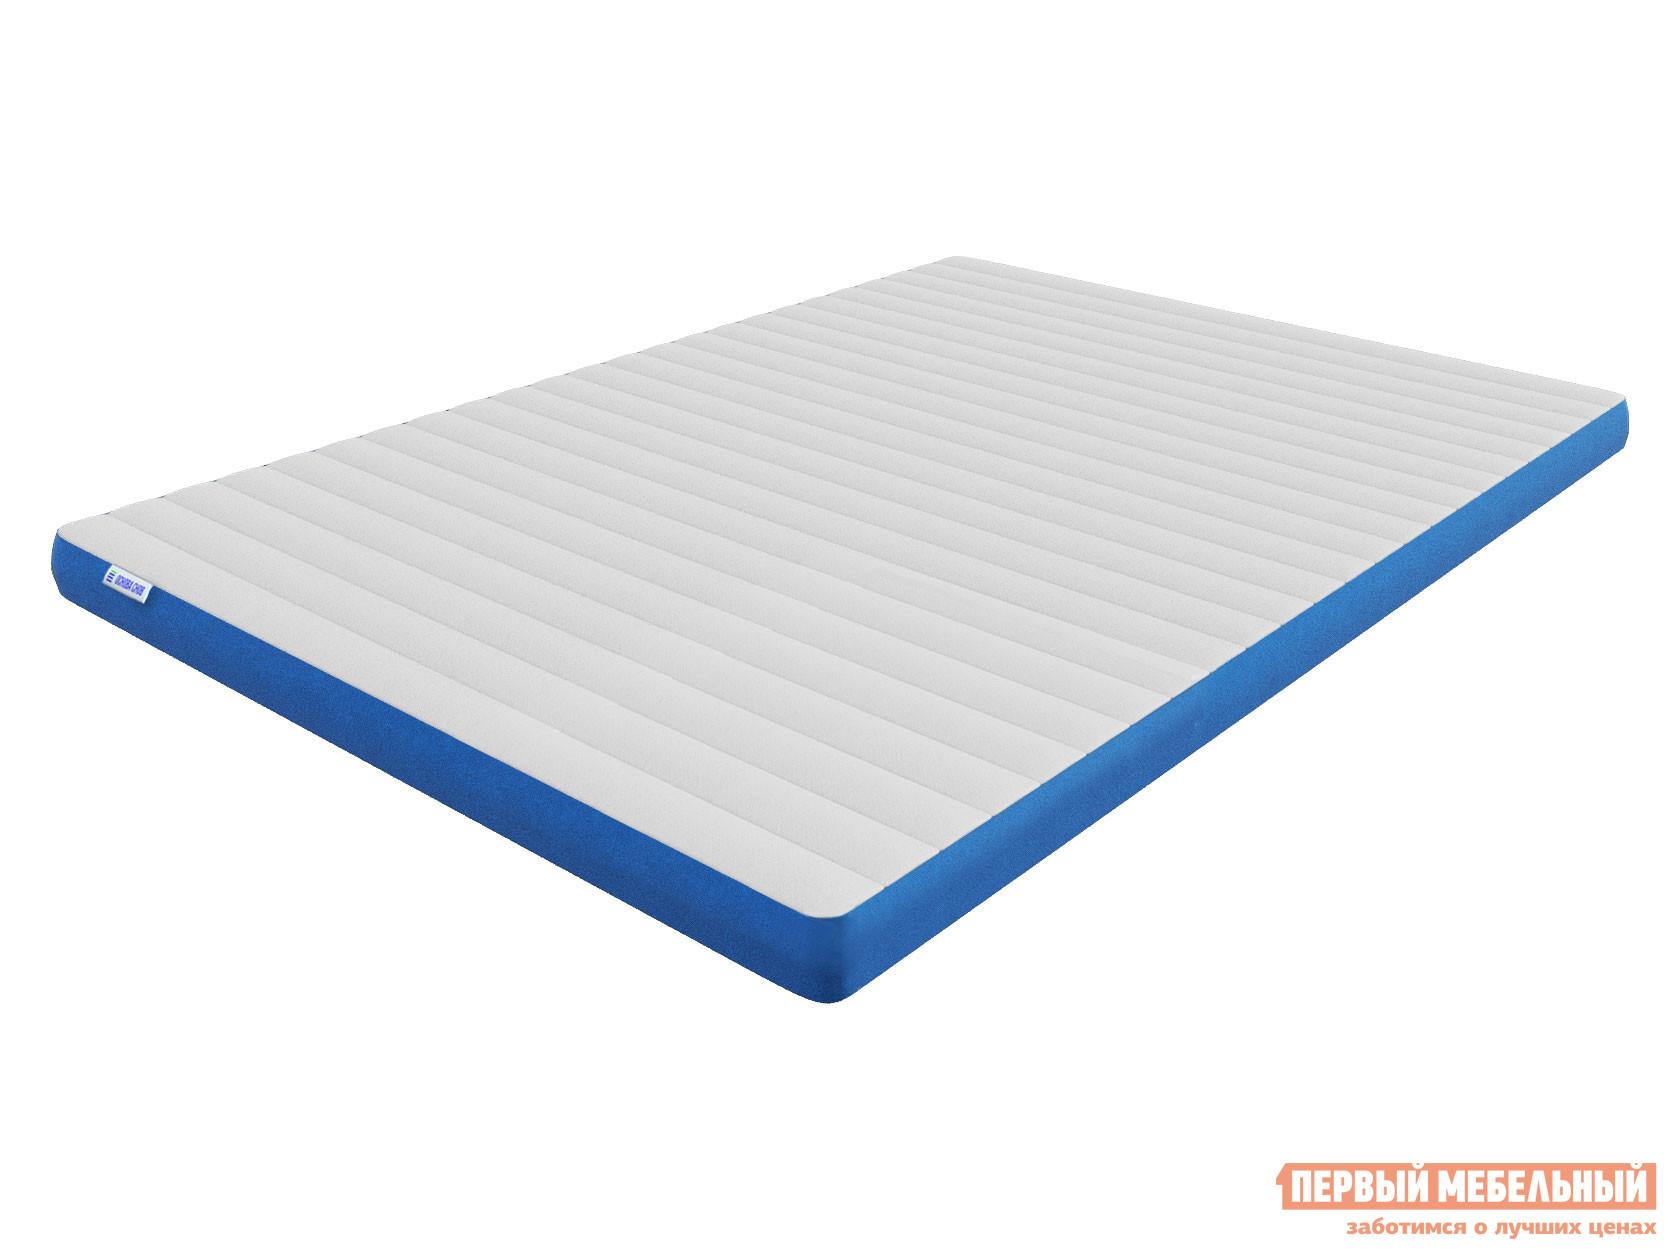 Топпер  Матрас-топпер Cool Wave Белый, 1600 Х 2000 мм Основа Снов 119605